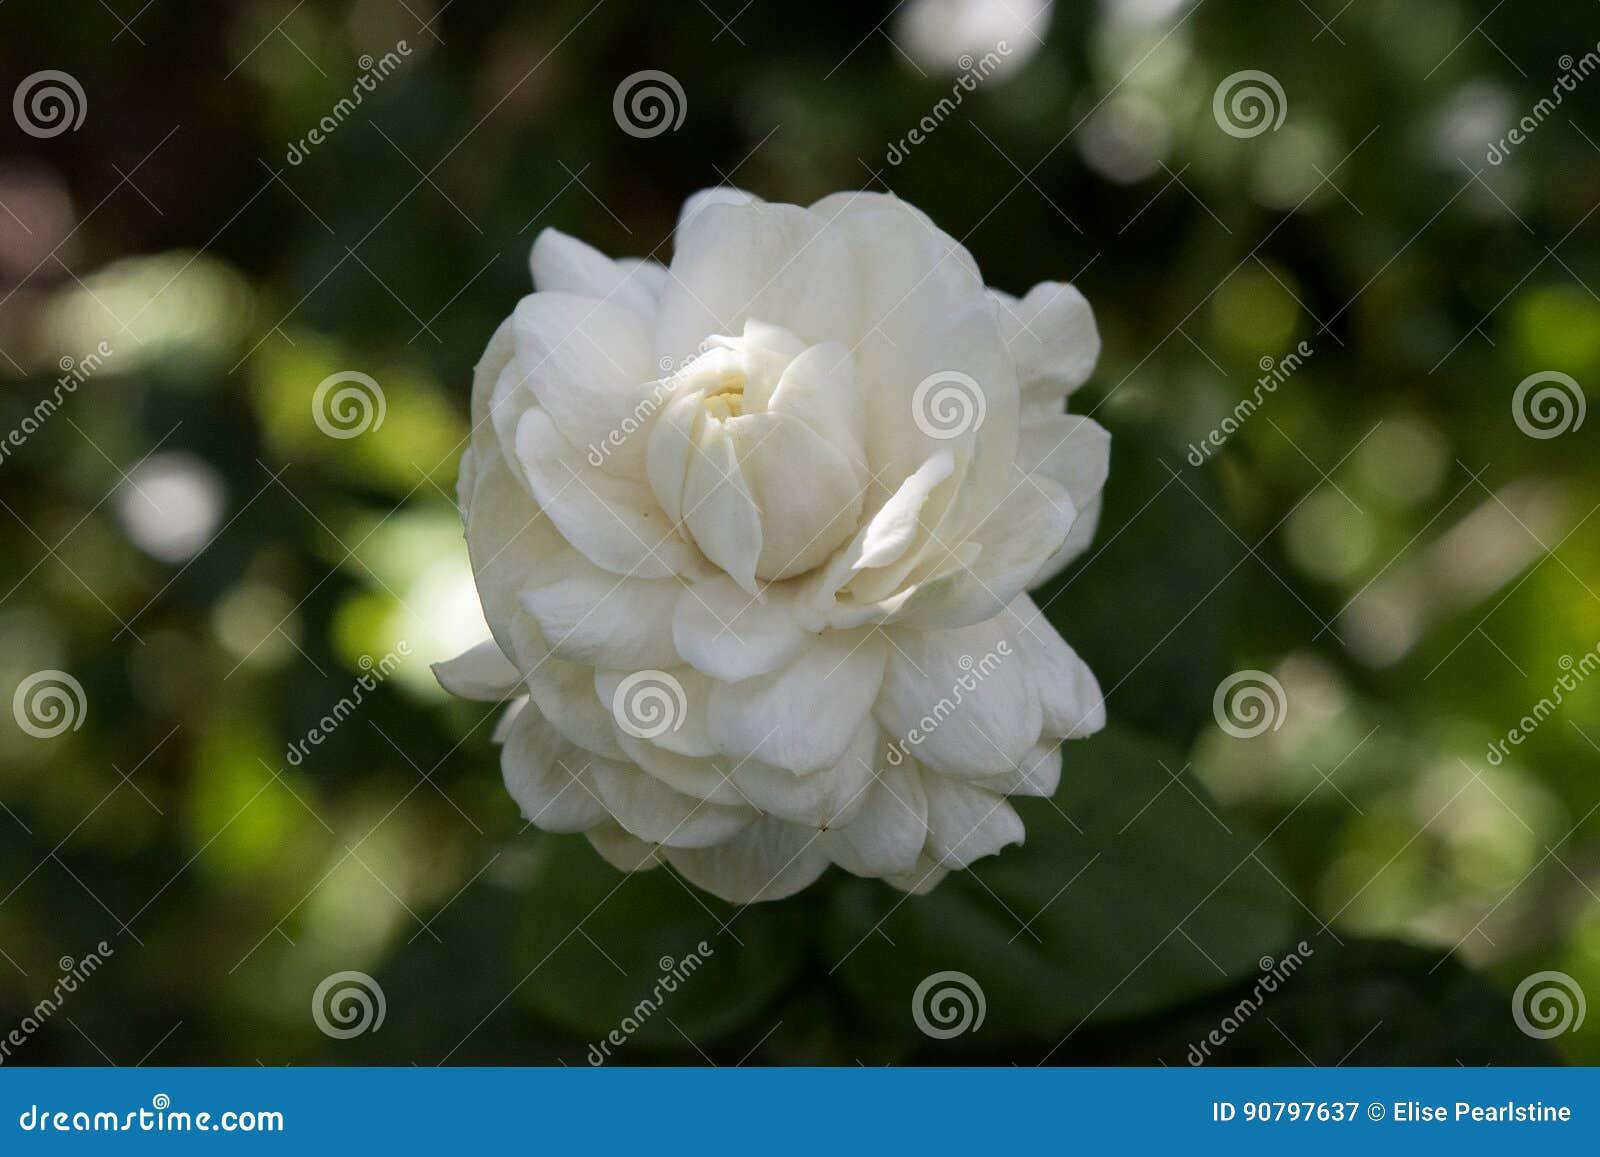 Double Jasmine Flower Images Flower Wallpaper Hd